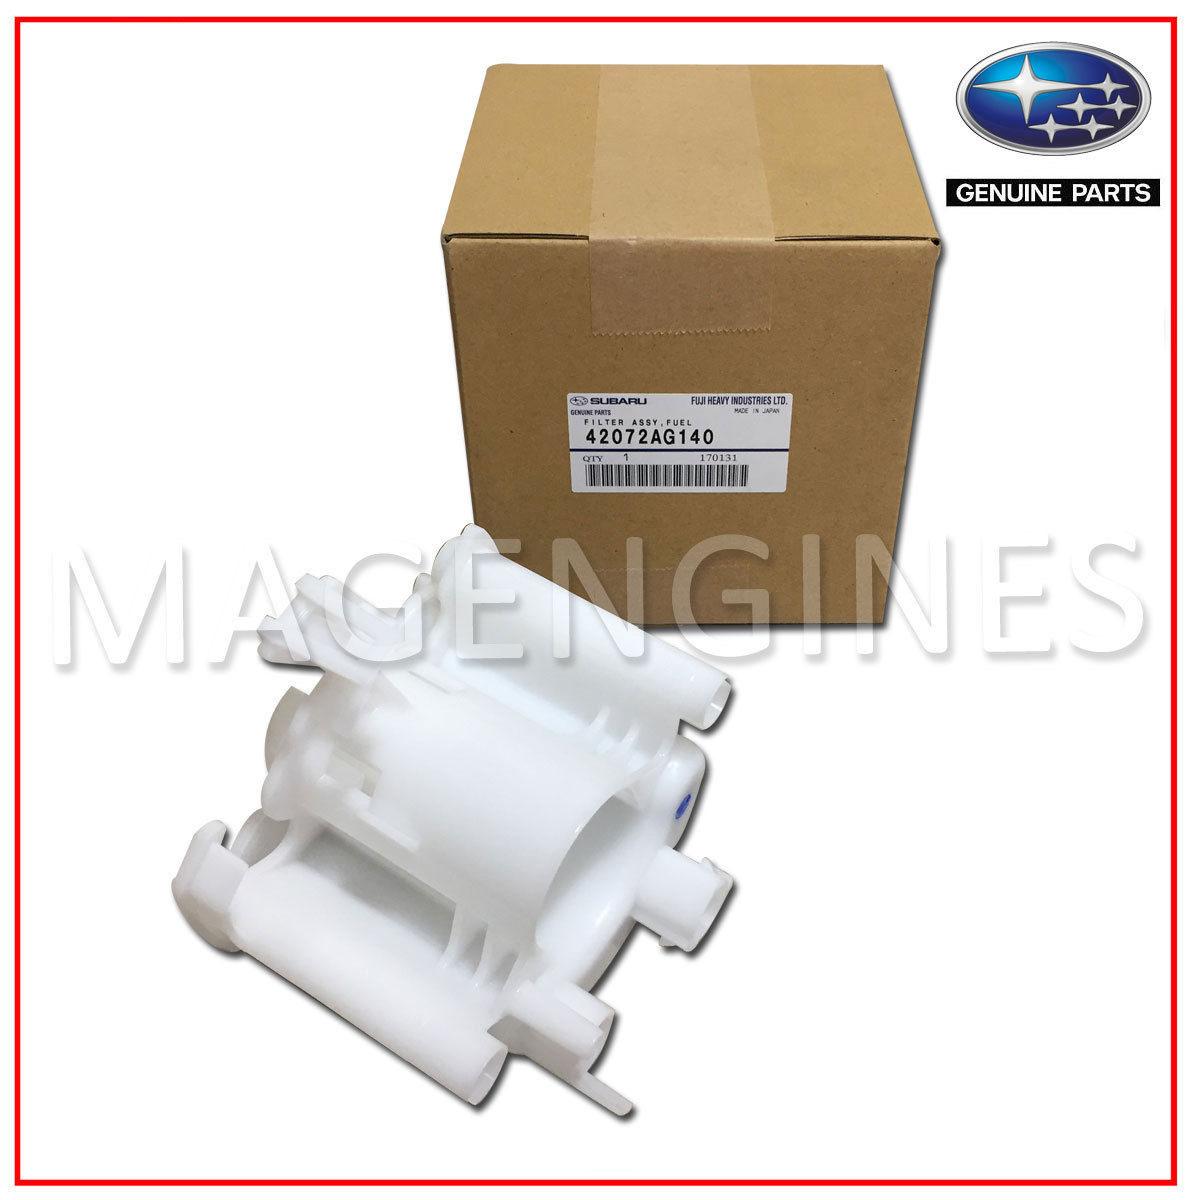 42072 Ag140 Subaru Genuine Fuel Pump Filter Mag Engines Wrx